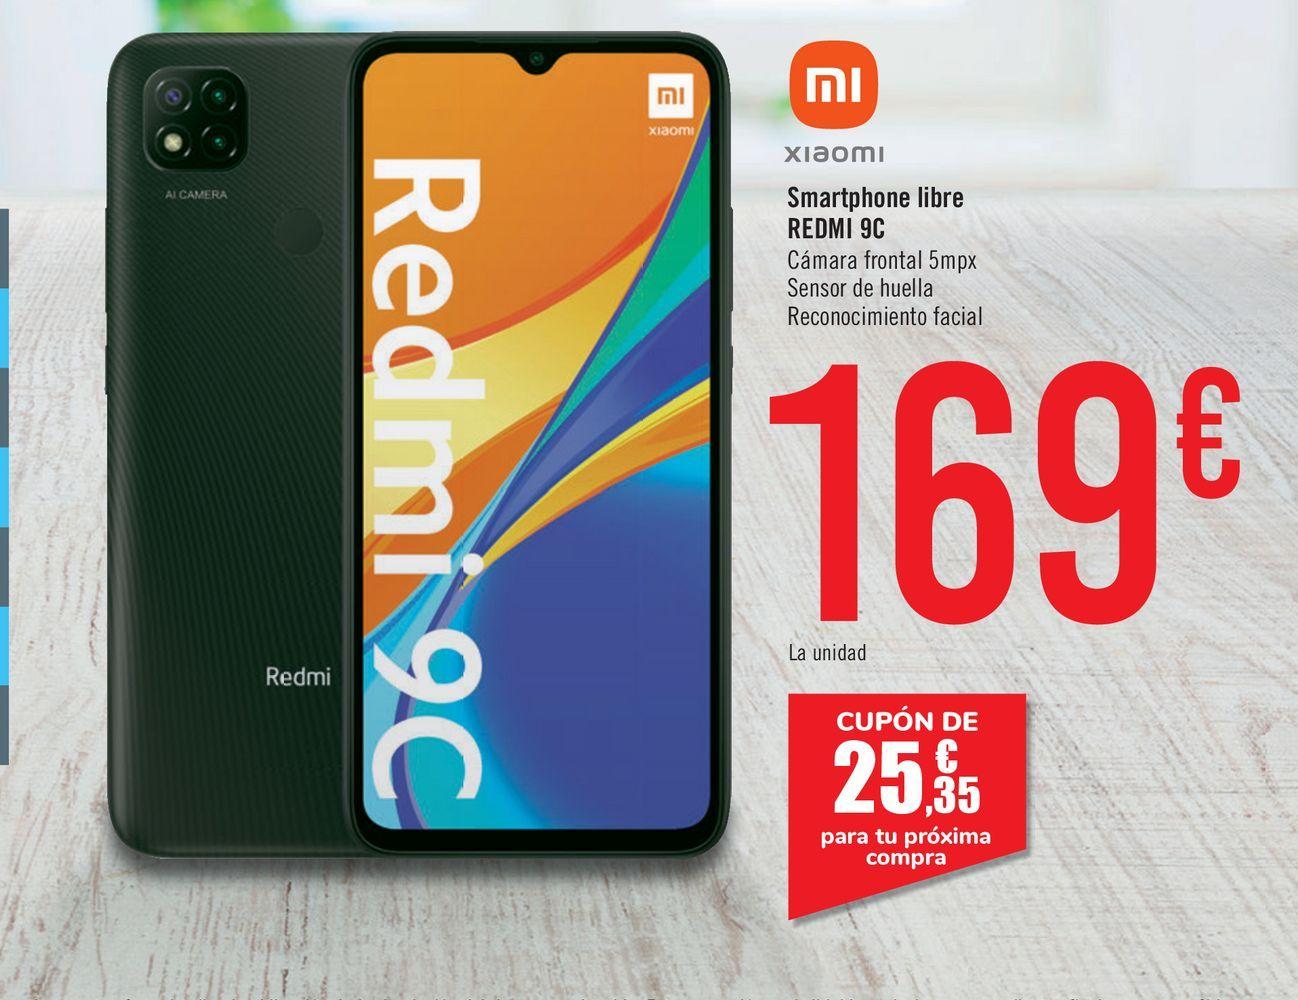 Oferta de Smartphones libre Redmi 9C por 169€